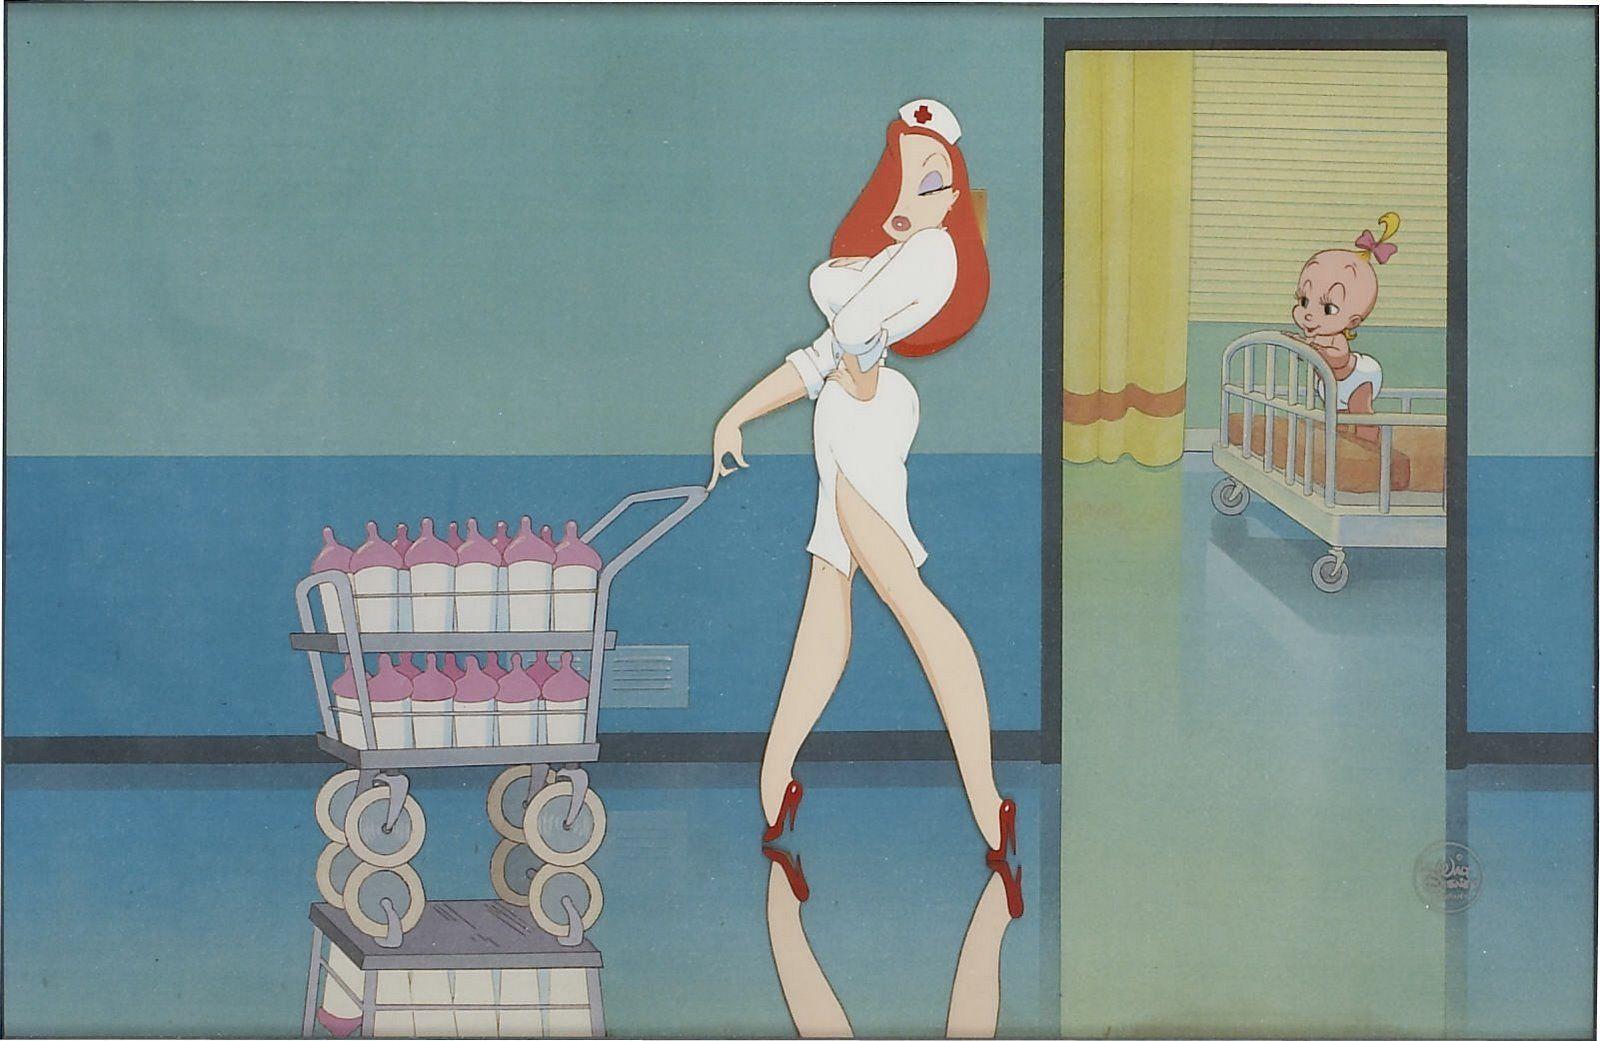 Dreamscene live wallpaper jessica rabbit erotic damsel - 3 part 1